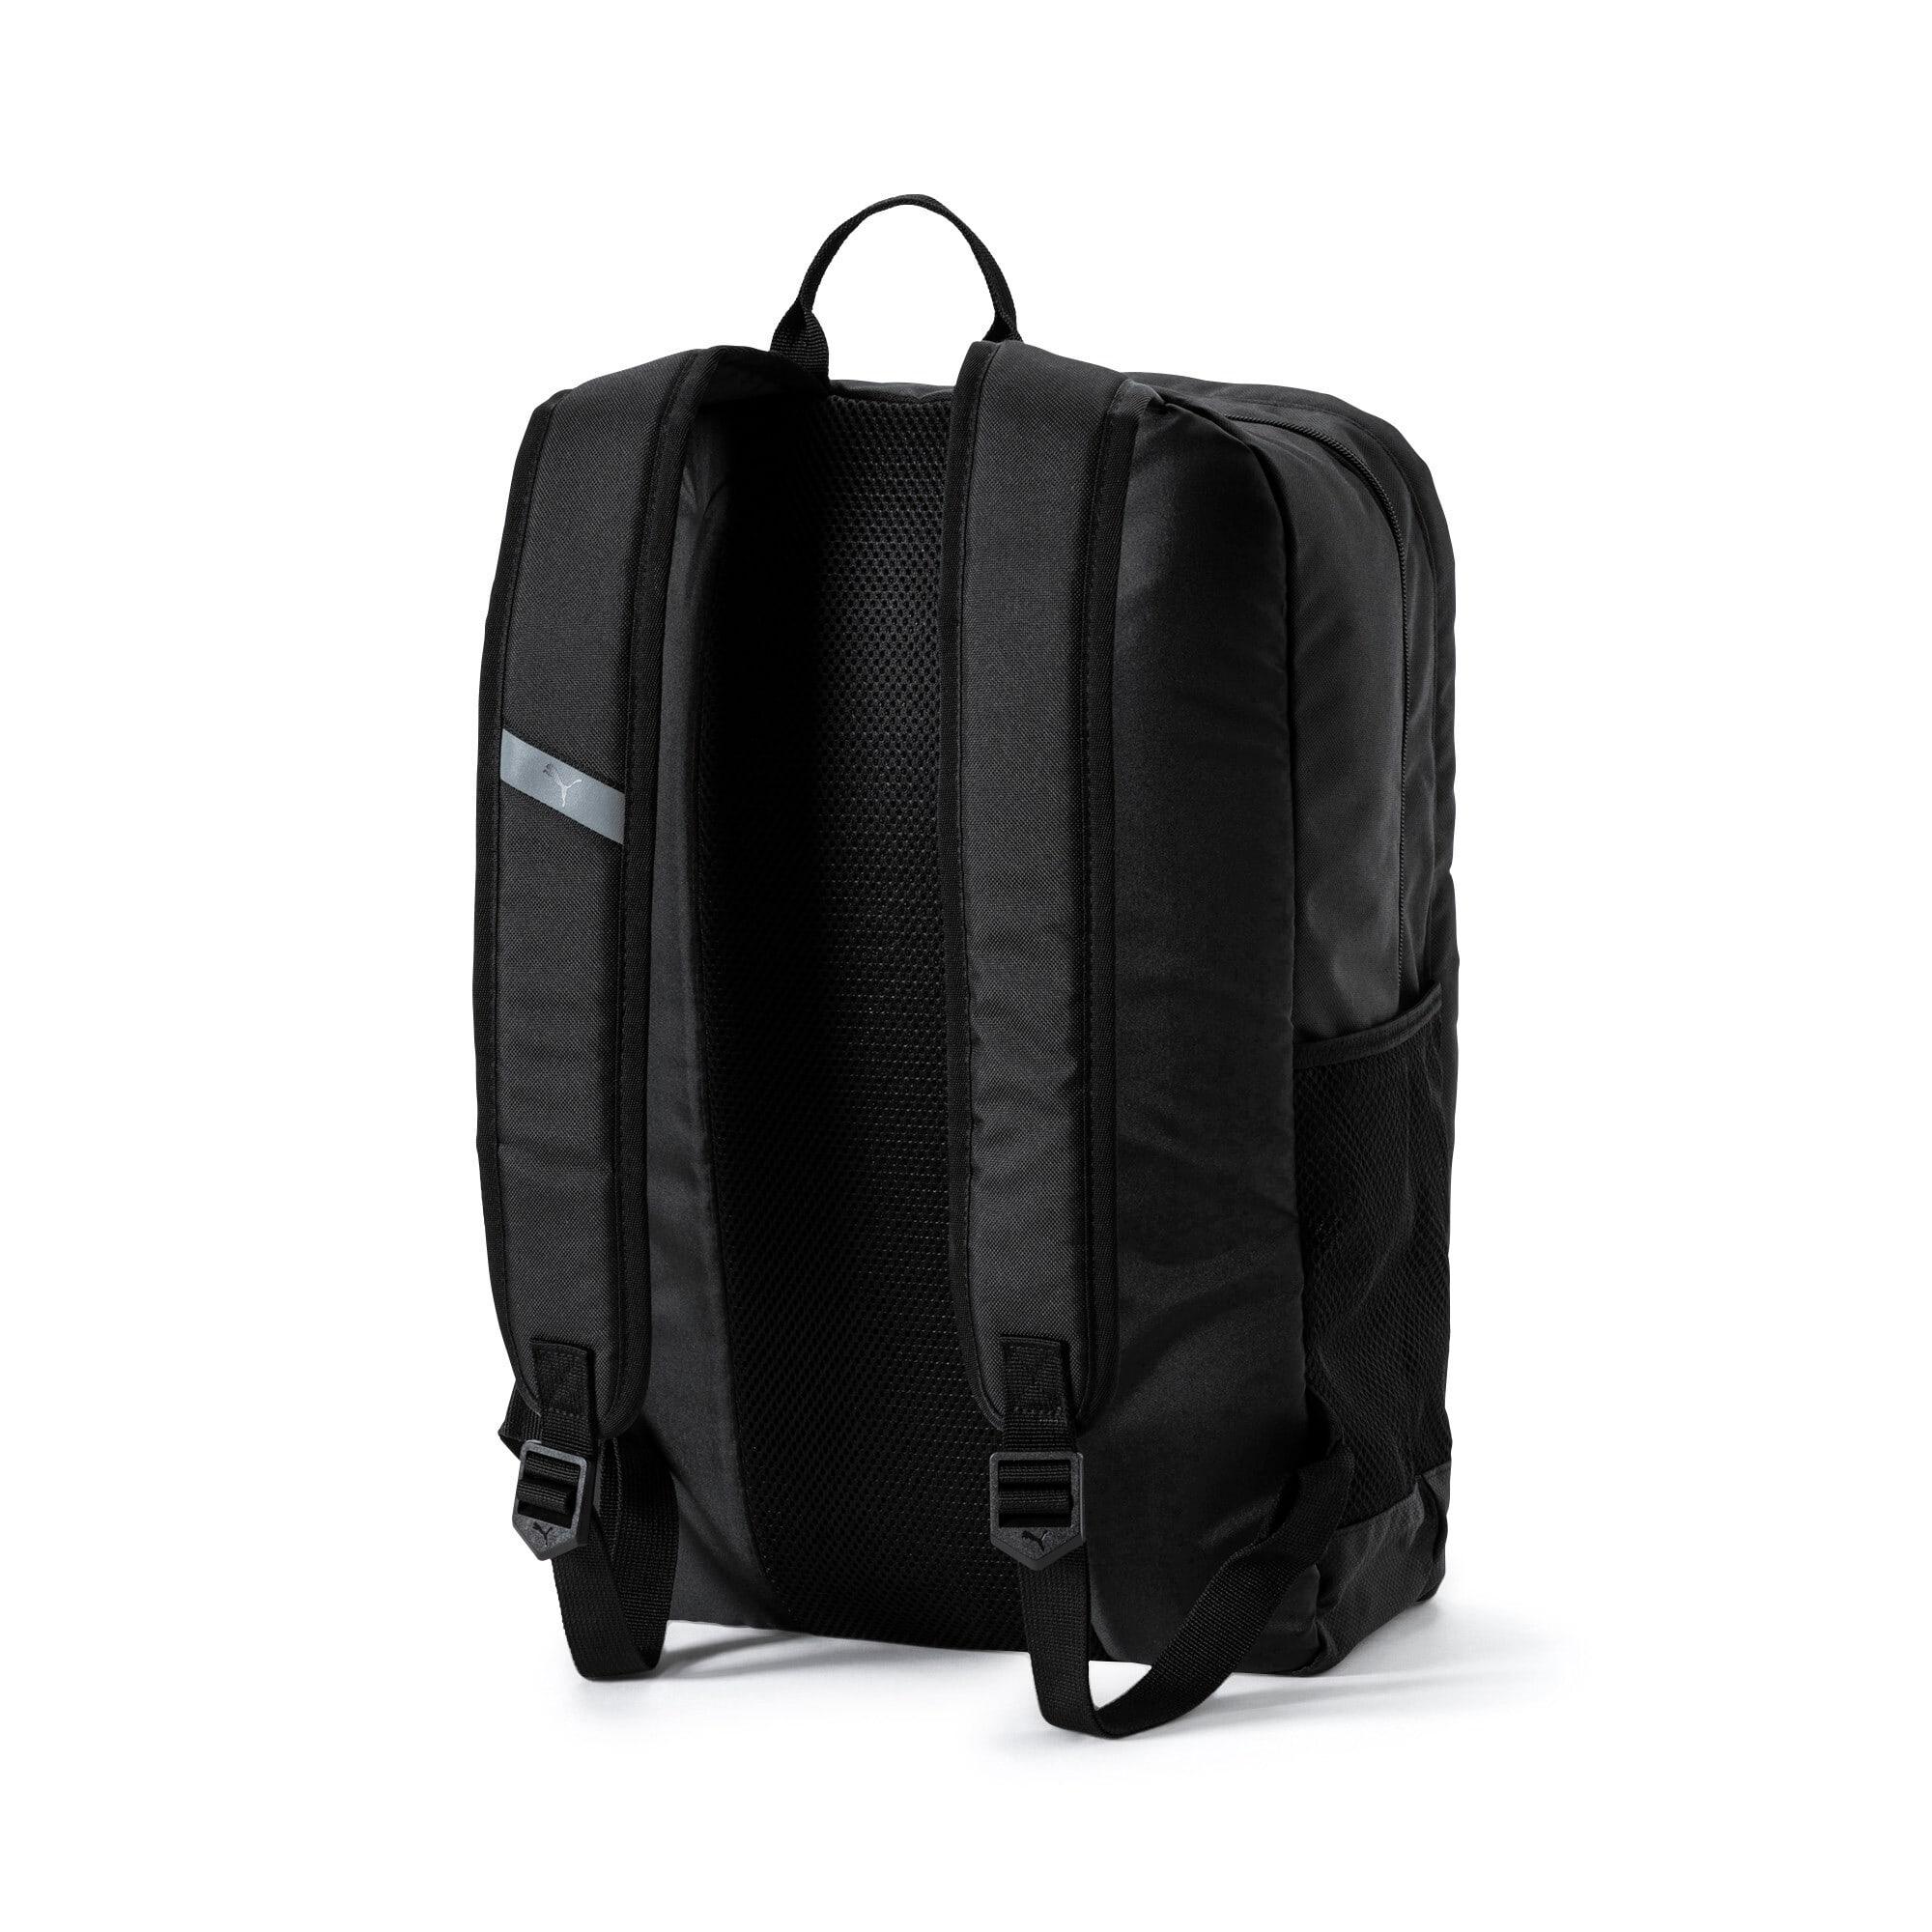 Thumbnail 2 of Square Backpack, Puma Black, medium